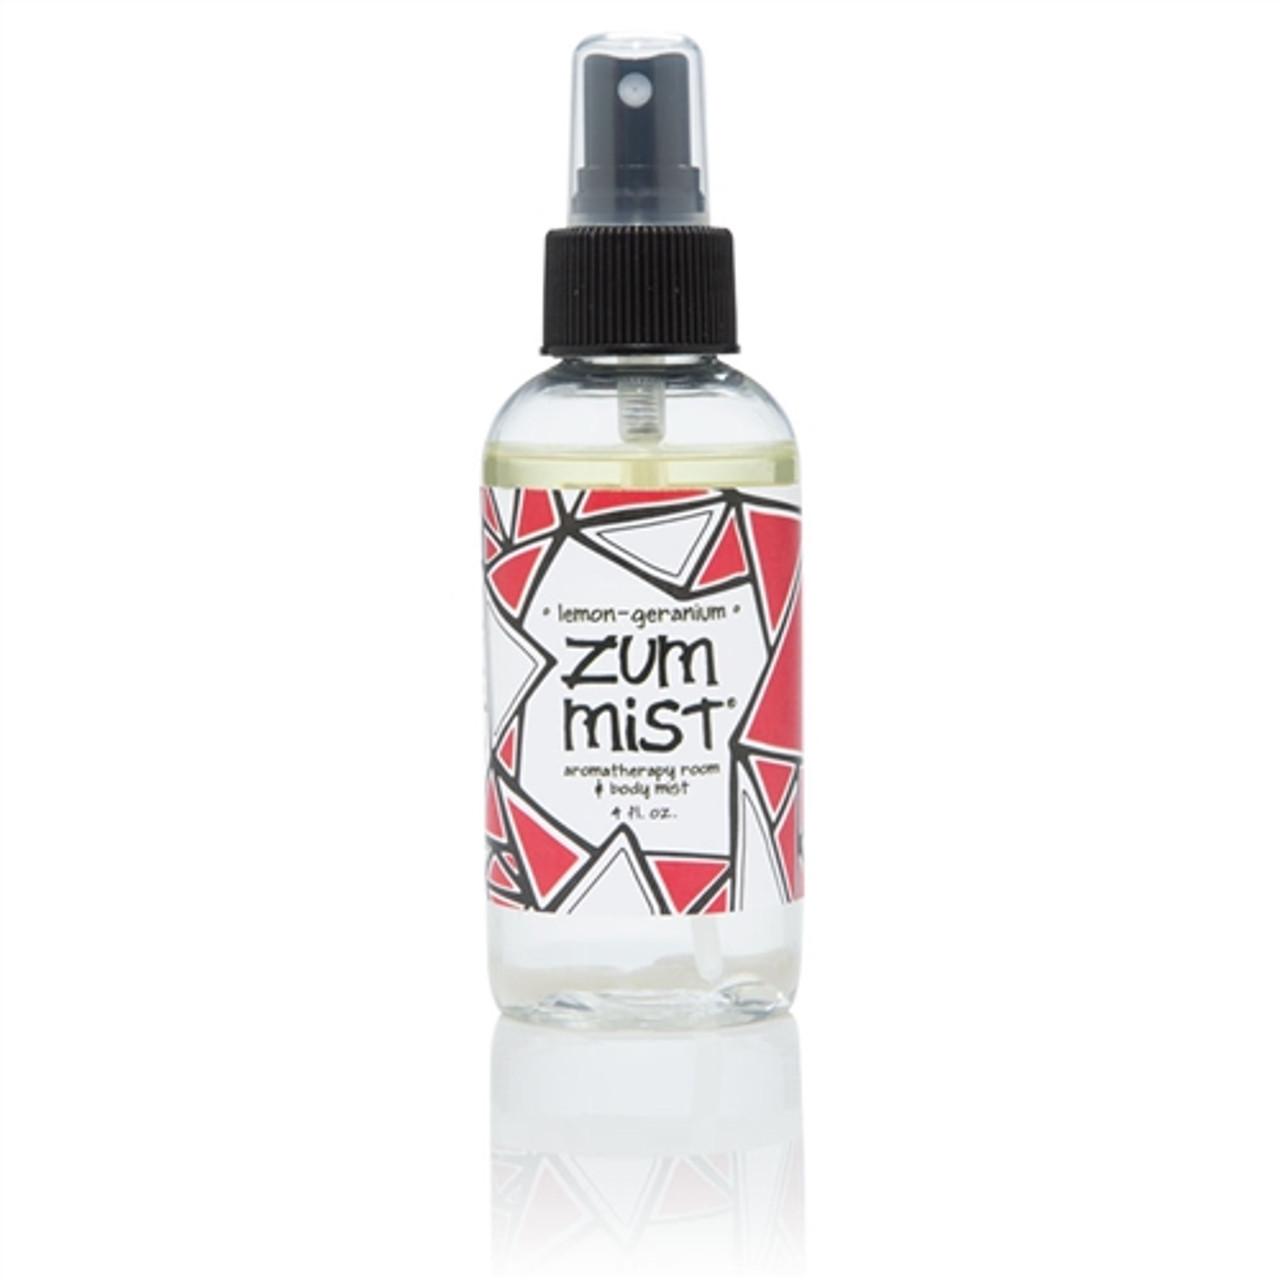 Essential Oil Room Spray - Lemon Geranium (or Body Mist)